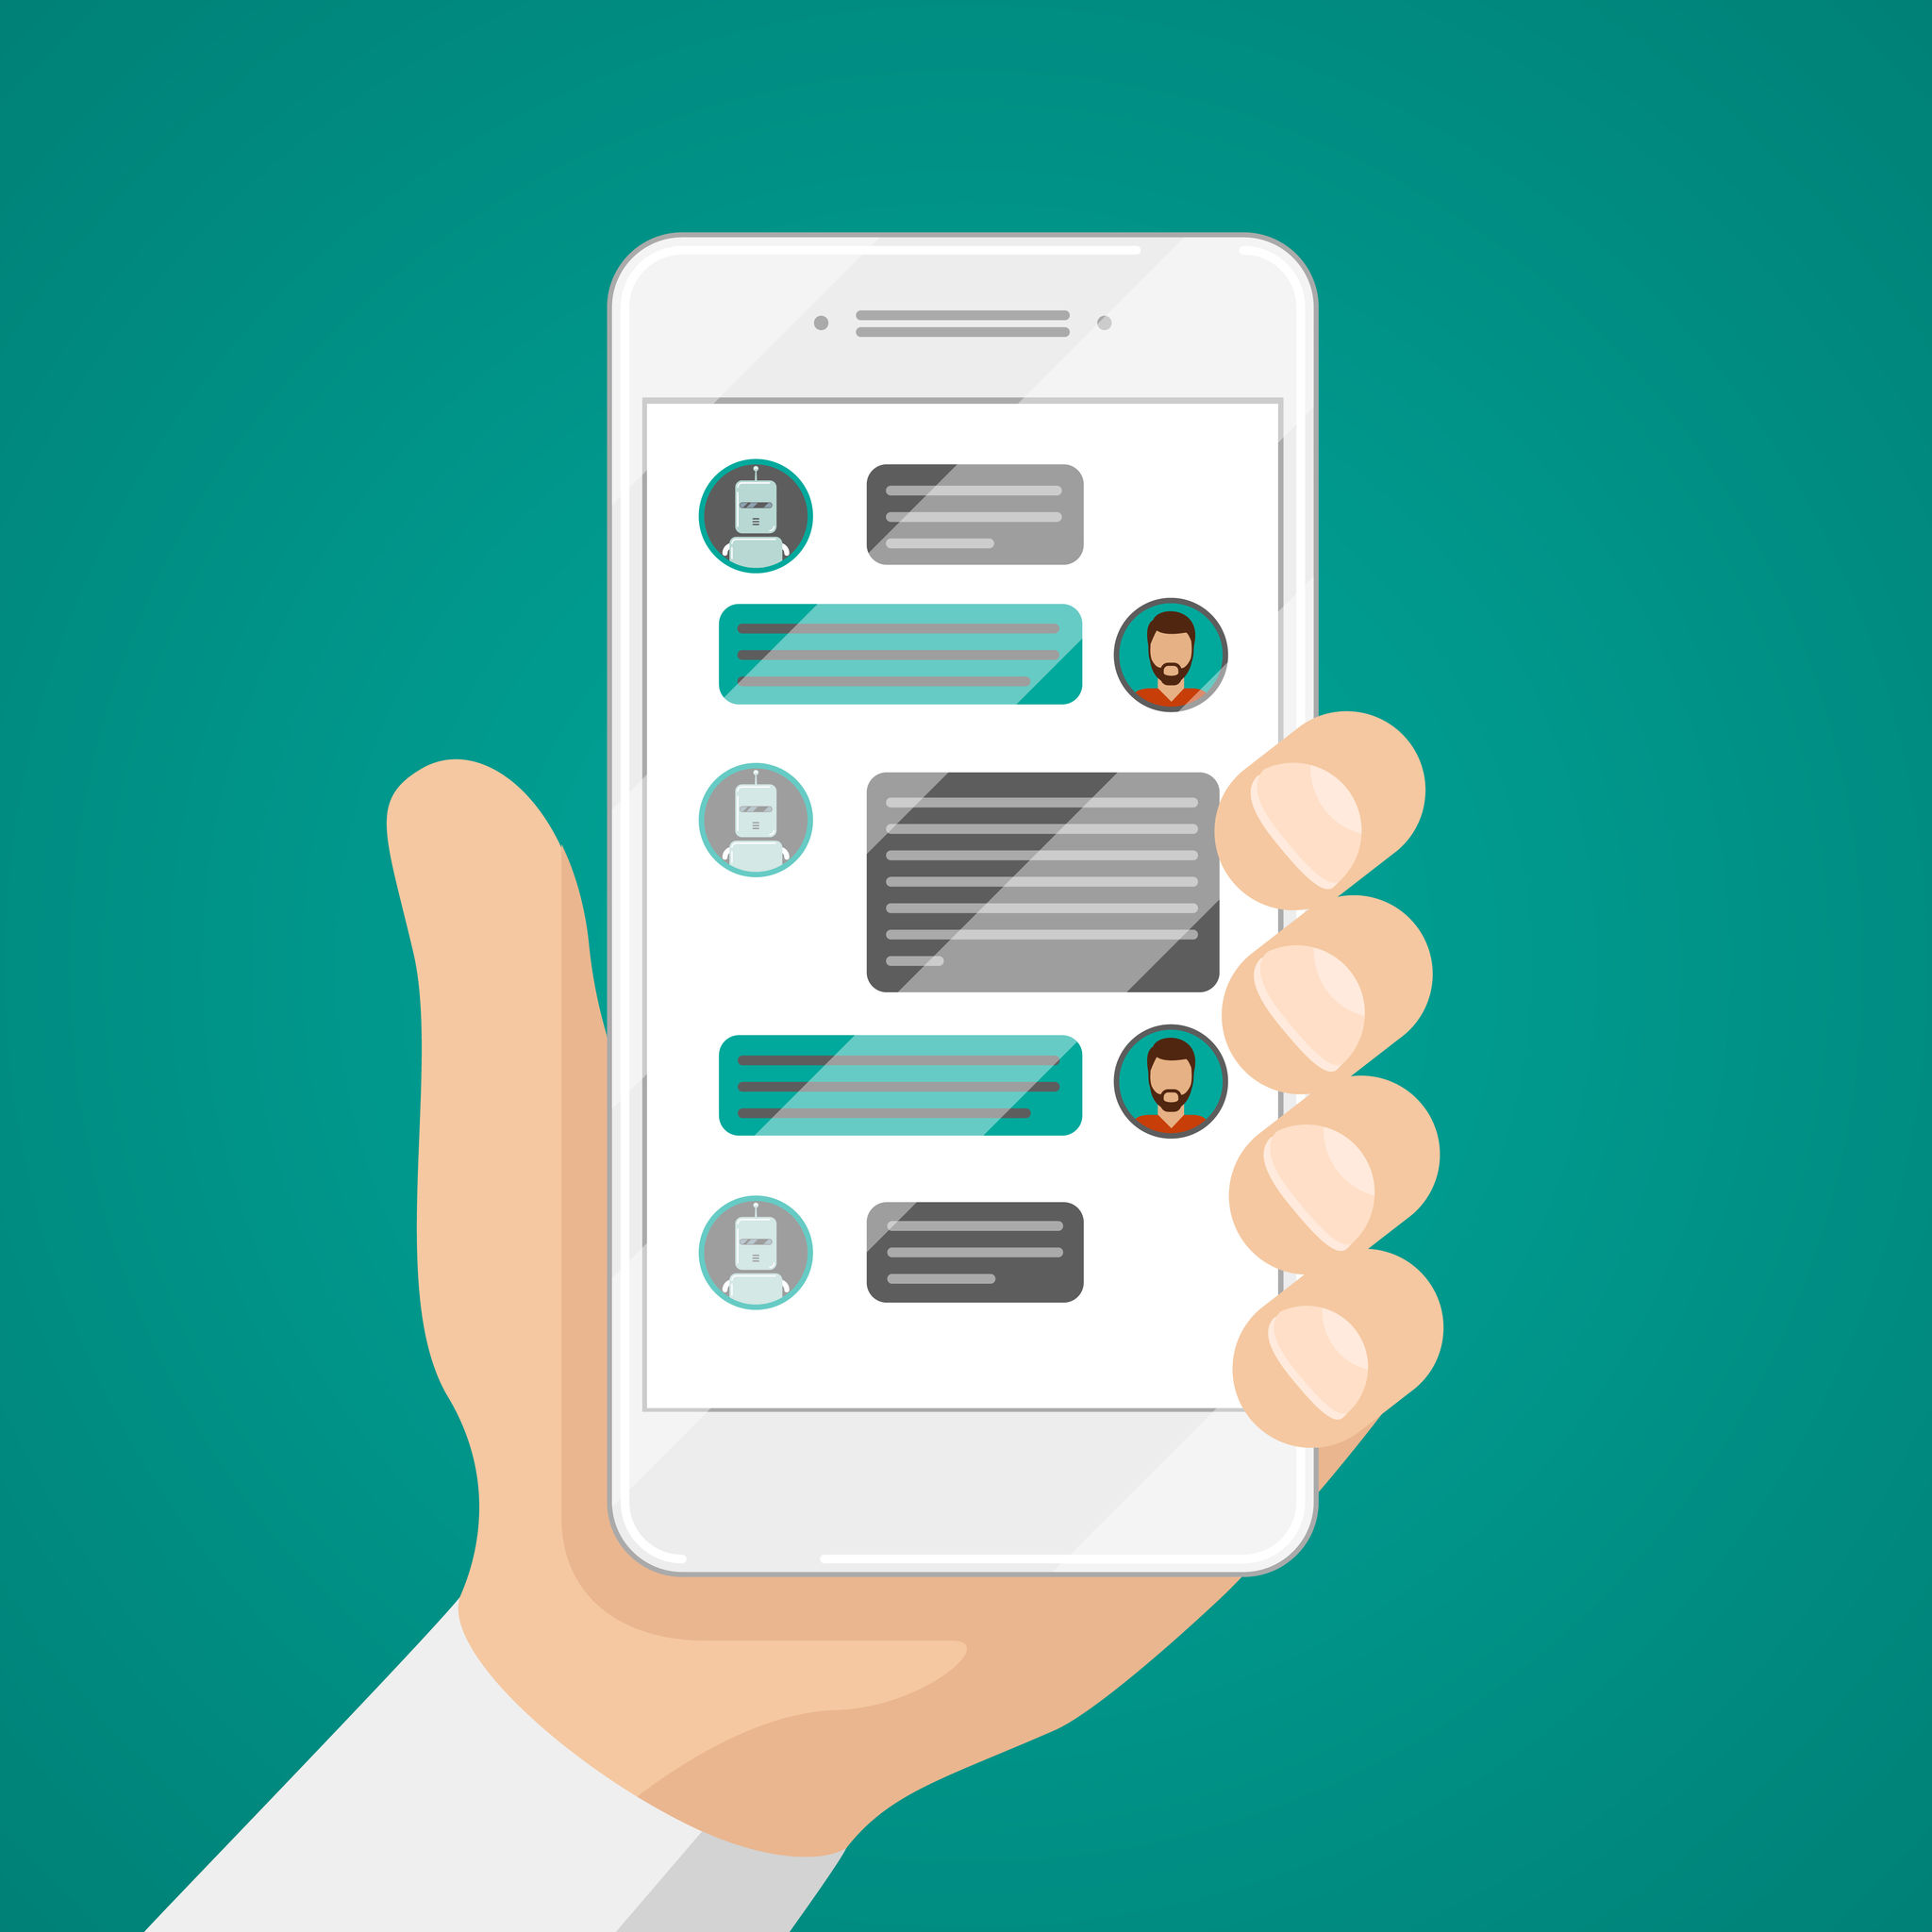 Mengenal Chatbot, Program Interaktif dengan Kecerdasan Buatan